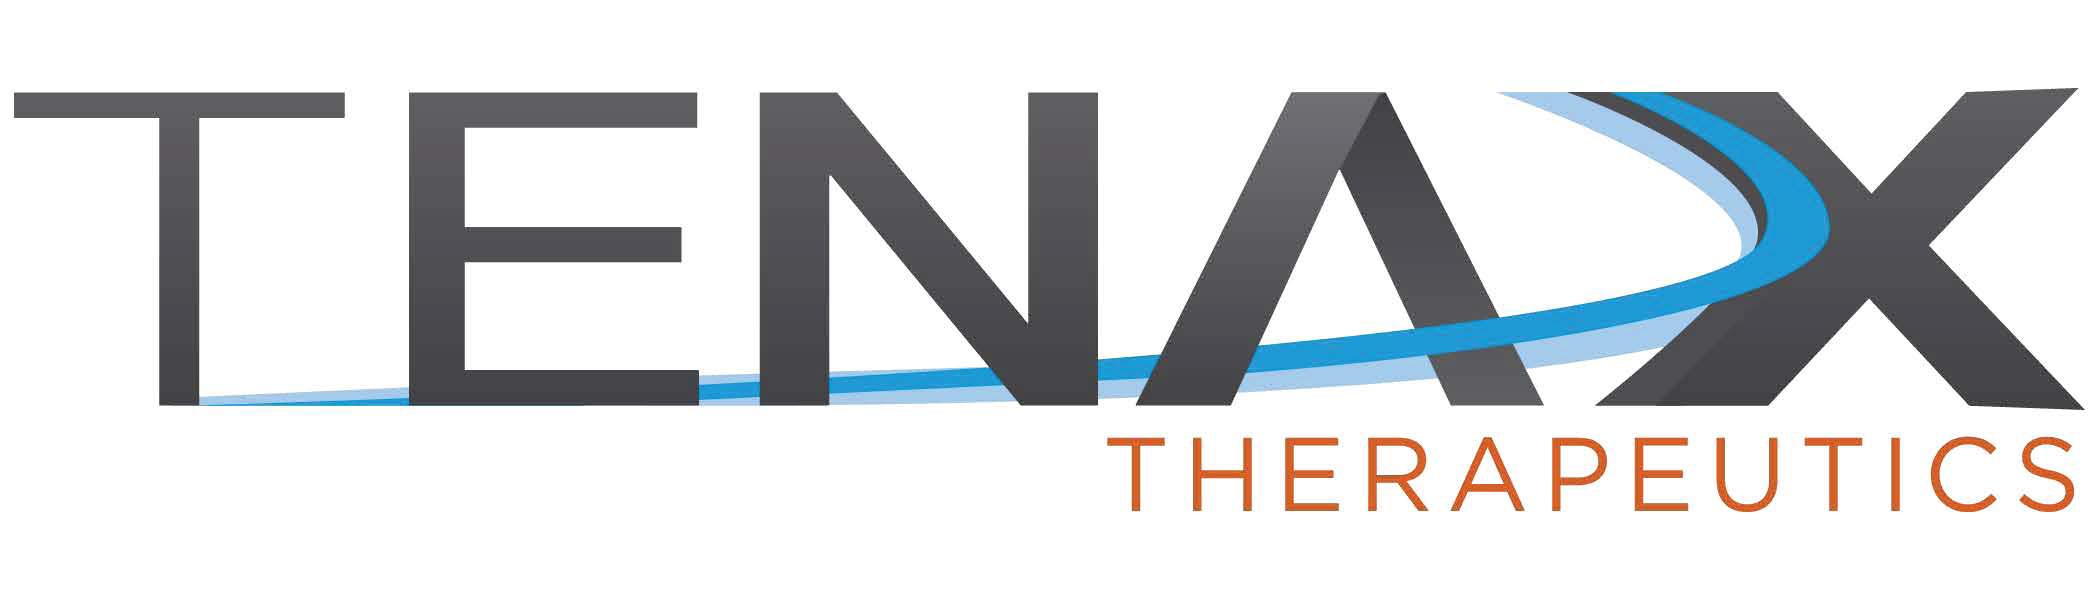 Tenax Therapeutics Inc